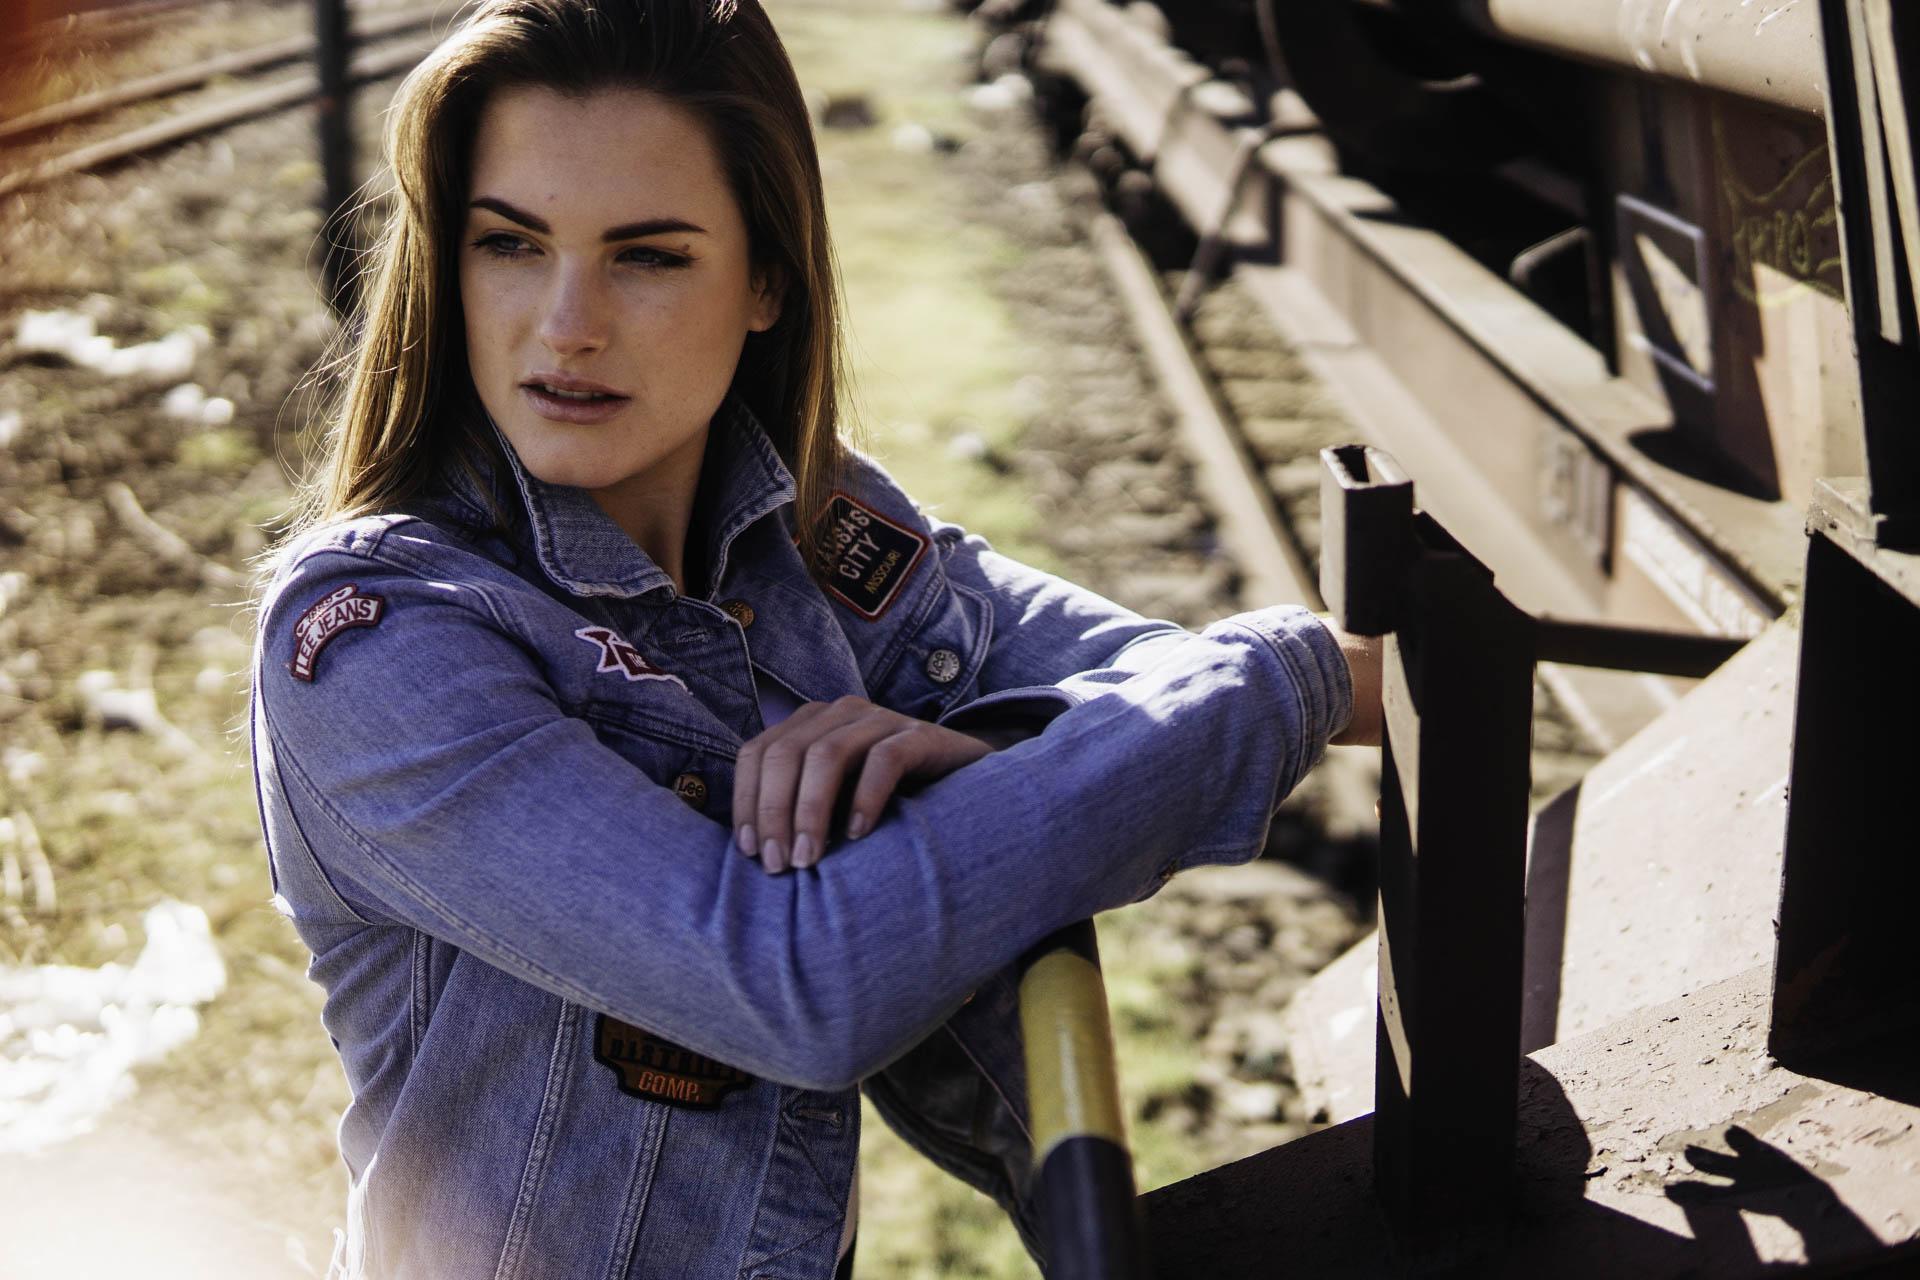 Münchener braunhaariges Model lehnt an Bahn Waggon in Jeansjacke